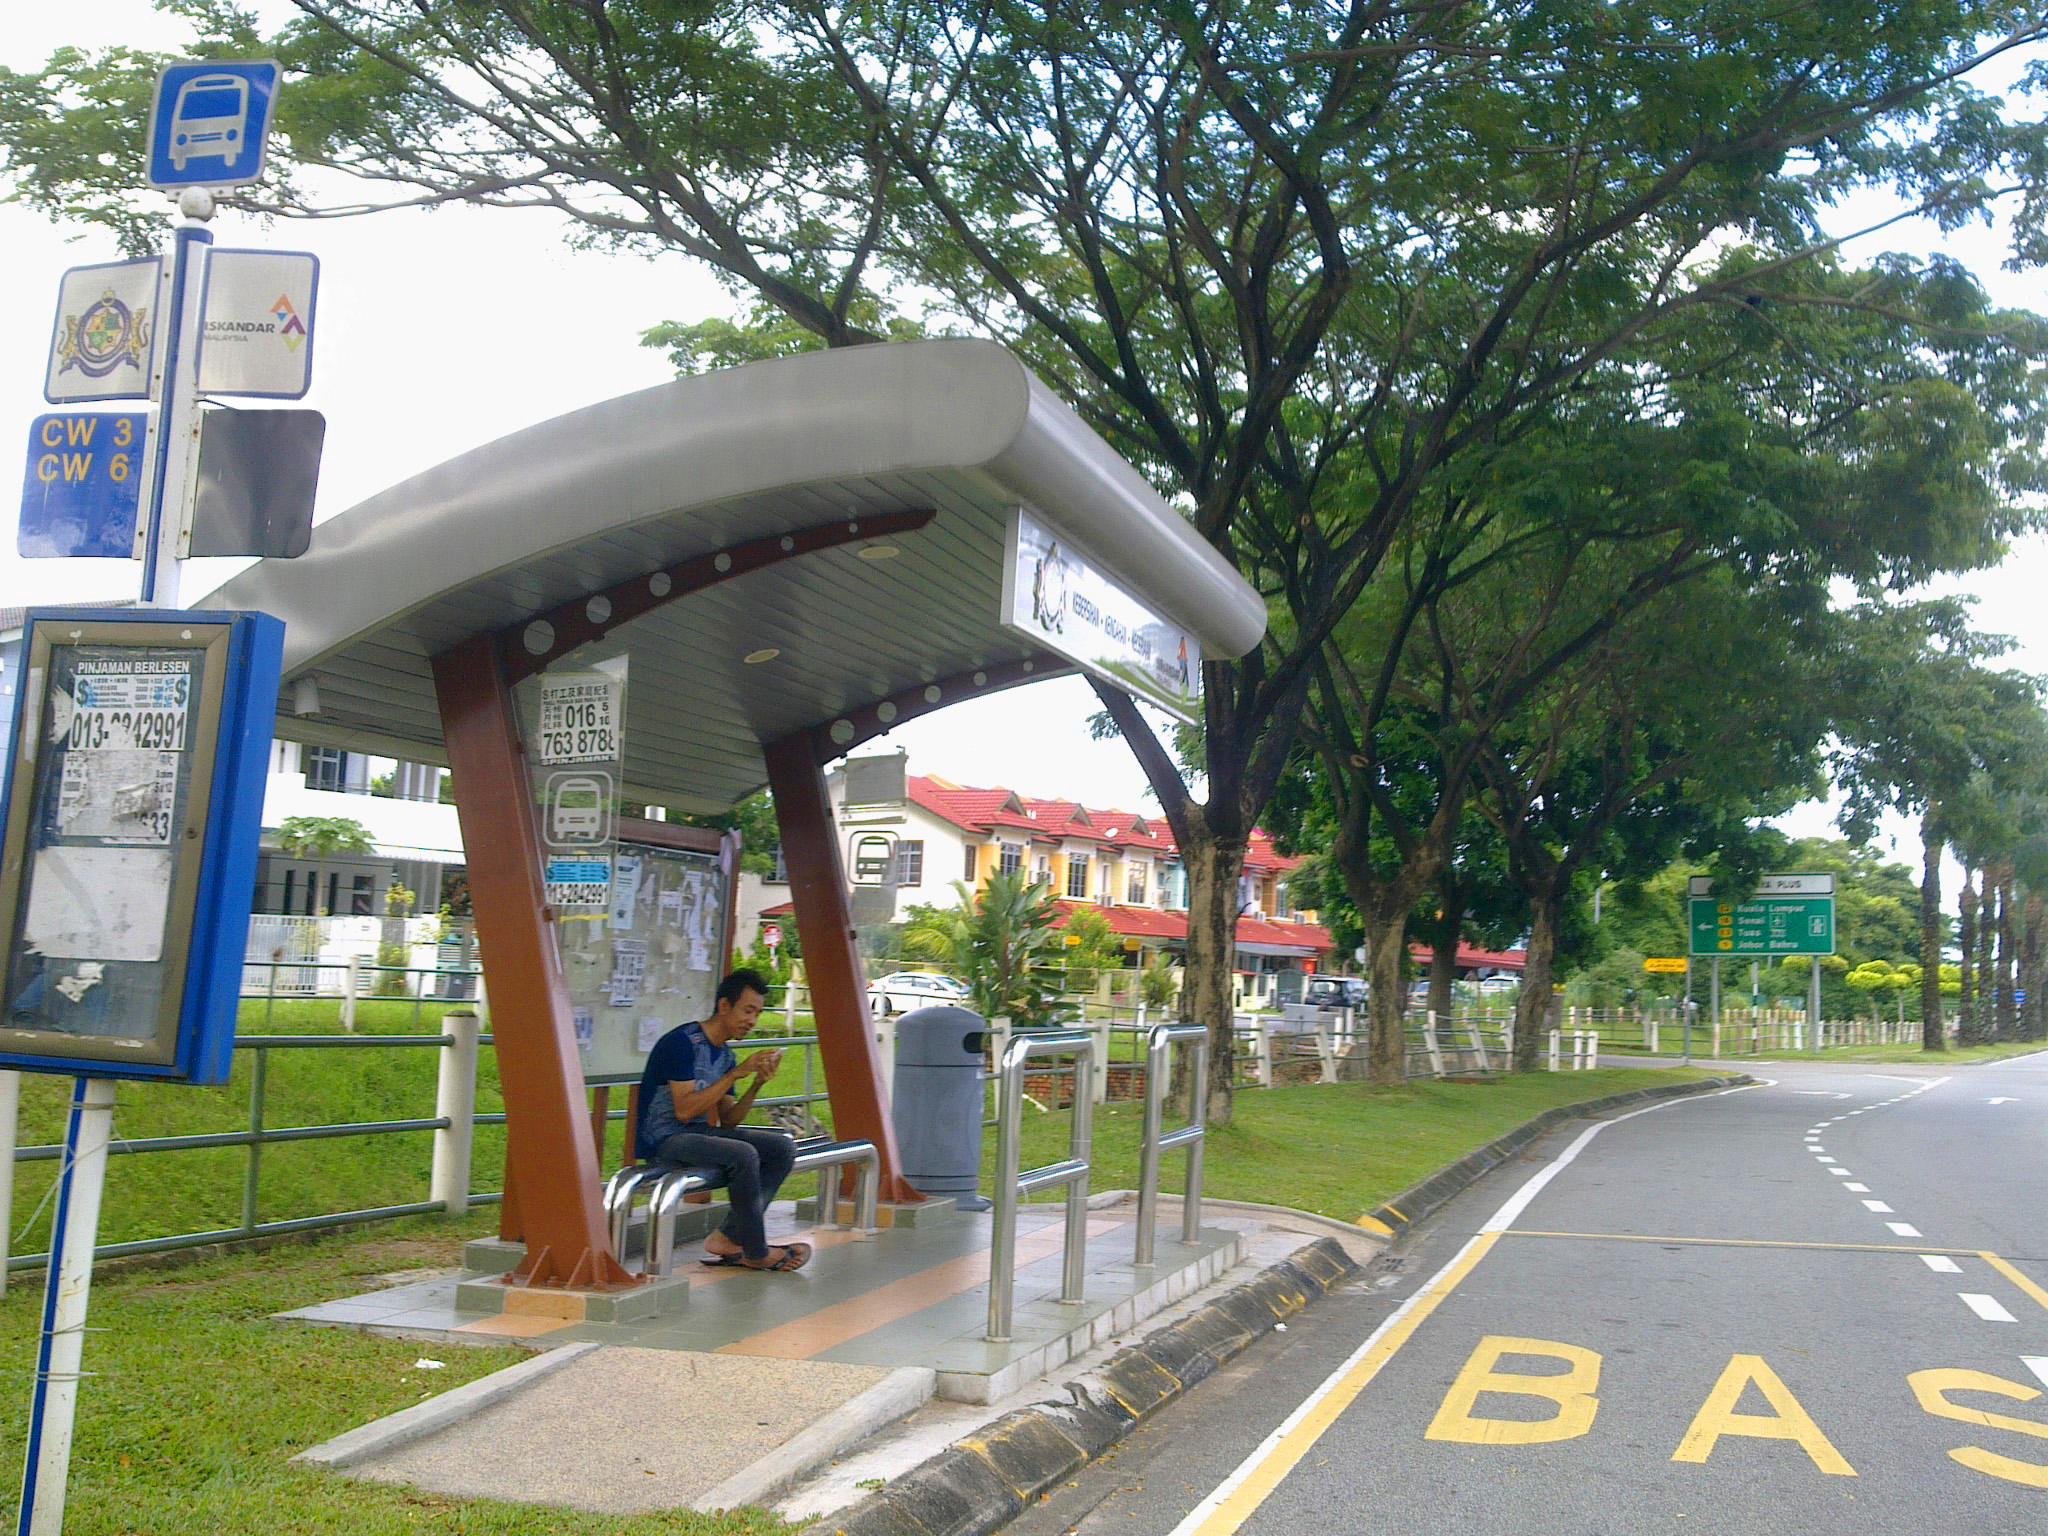 Guesthouse Homestay Near Legoland Malaysia Nusajaya Johor Bahru Tiket 01 Day Combo Theme Park Water Anak 3 11 Bus Stop